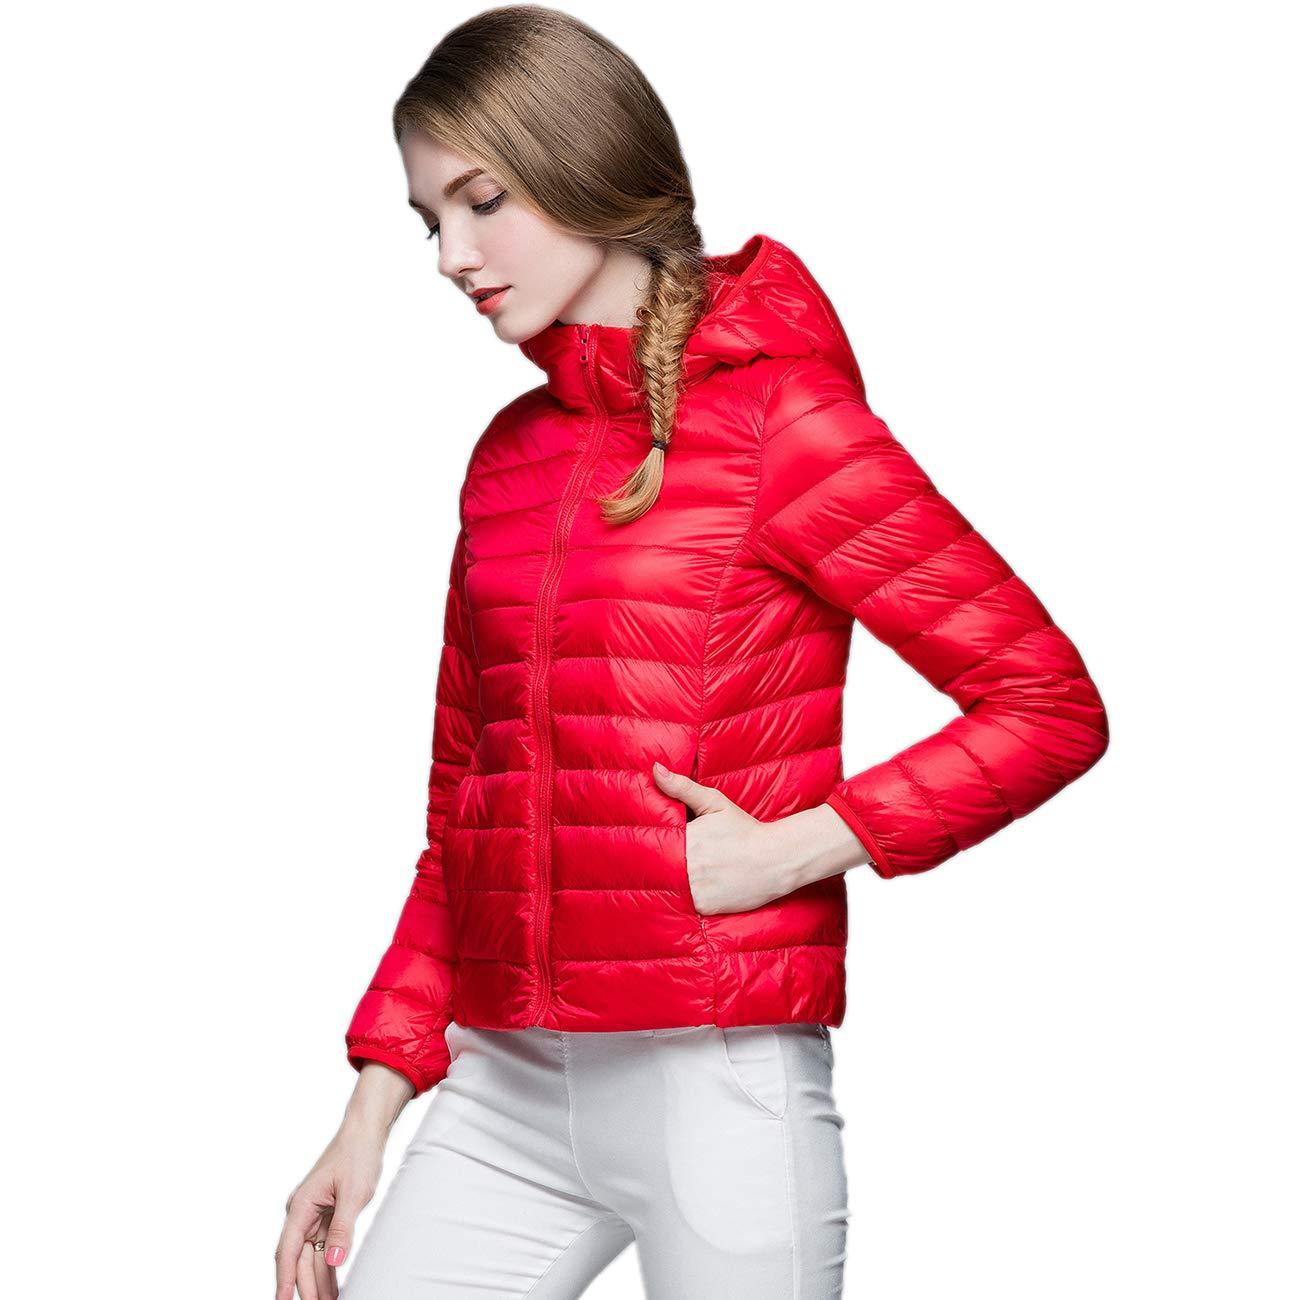 KIWI RATA Women's Hooded Packable Ultra Light Weight Short Down Jacket - Travel Bag by KIWI RATA (Image #4)